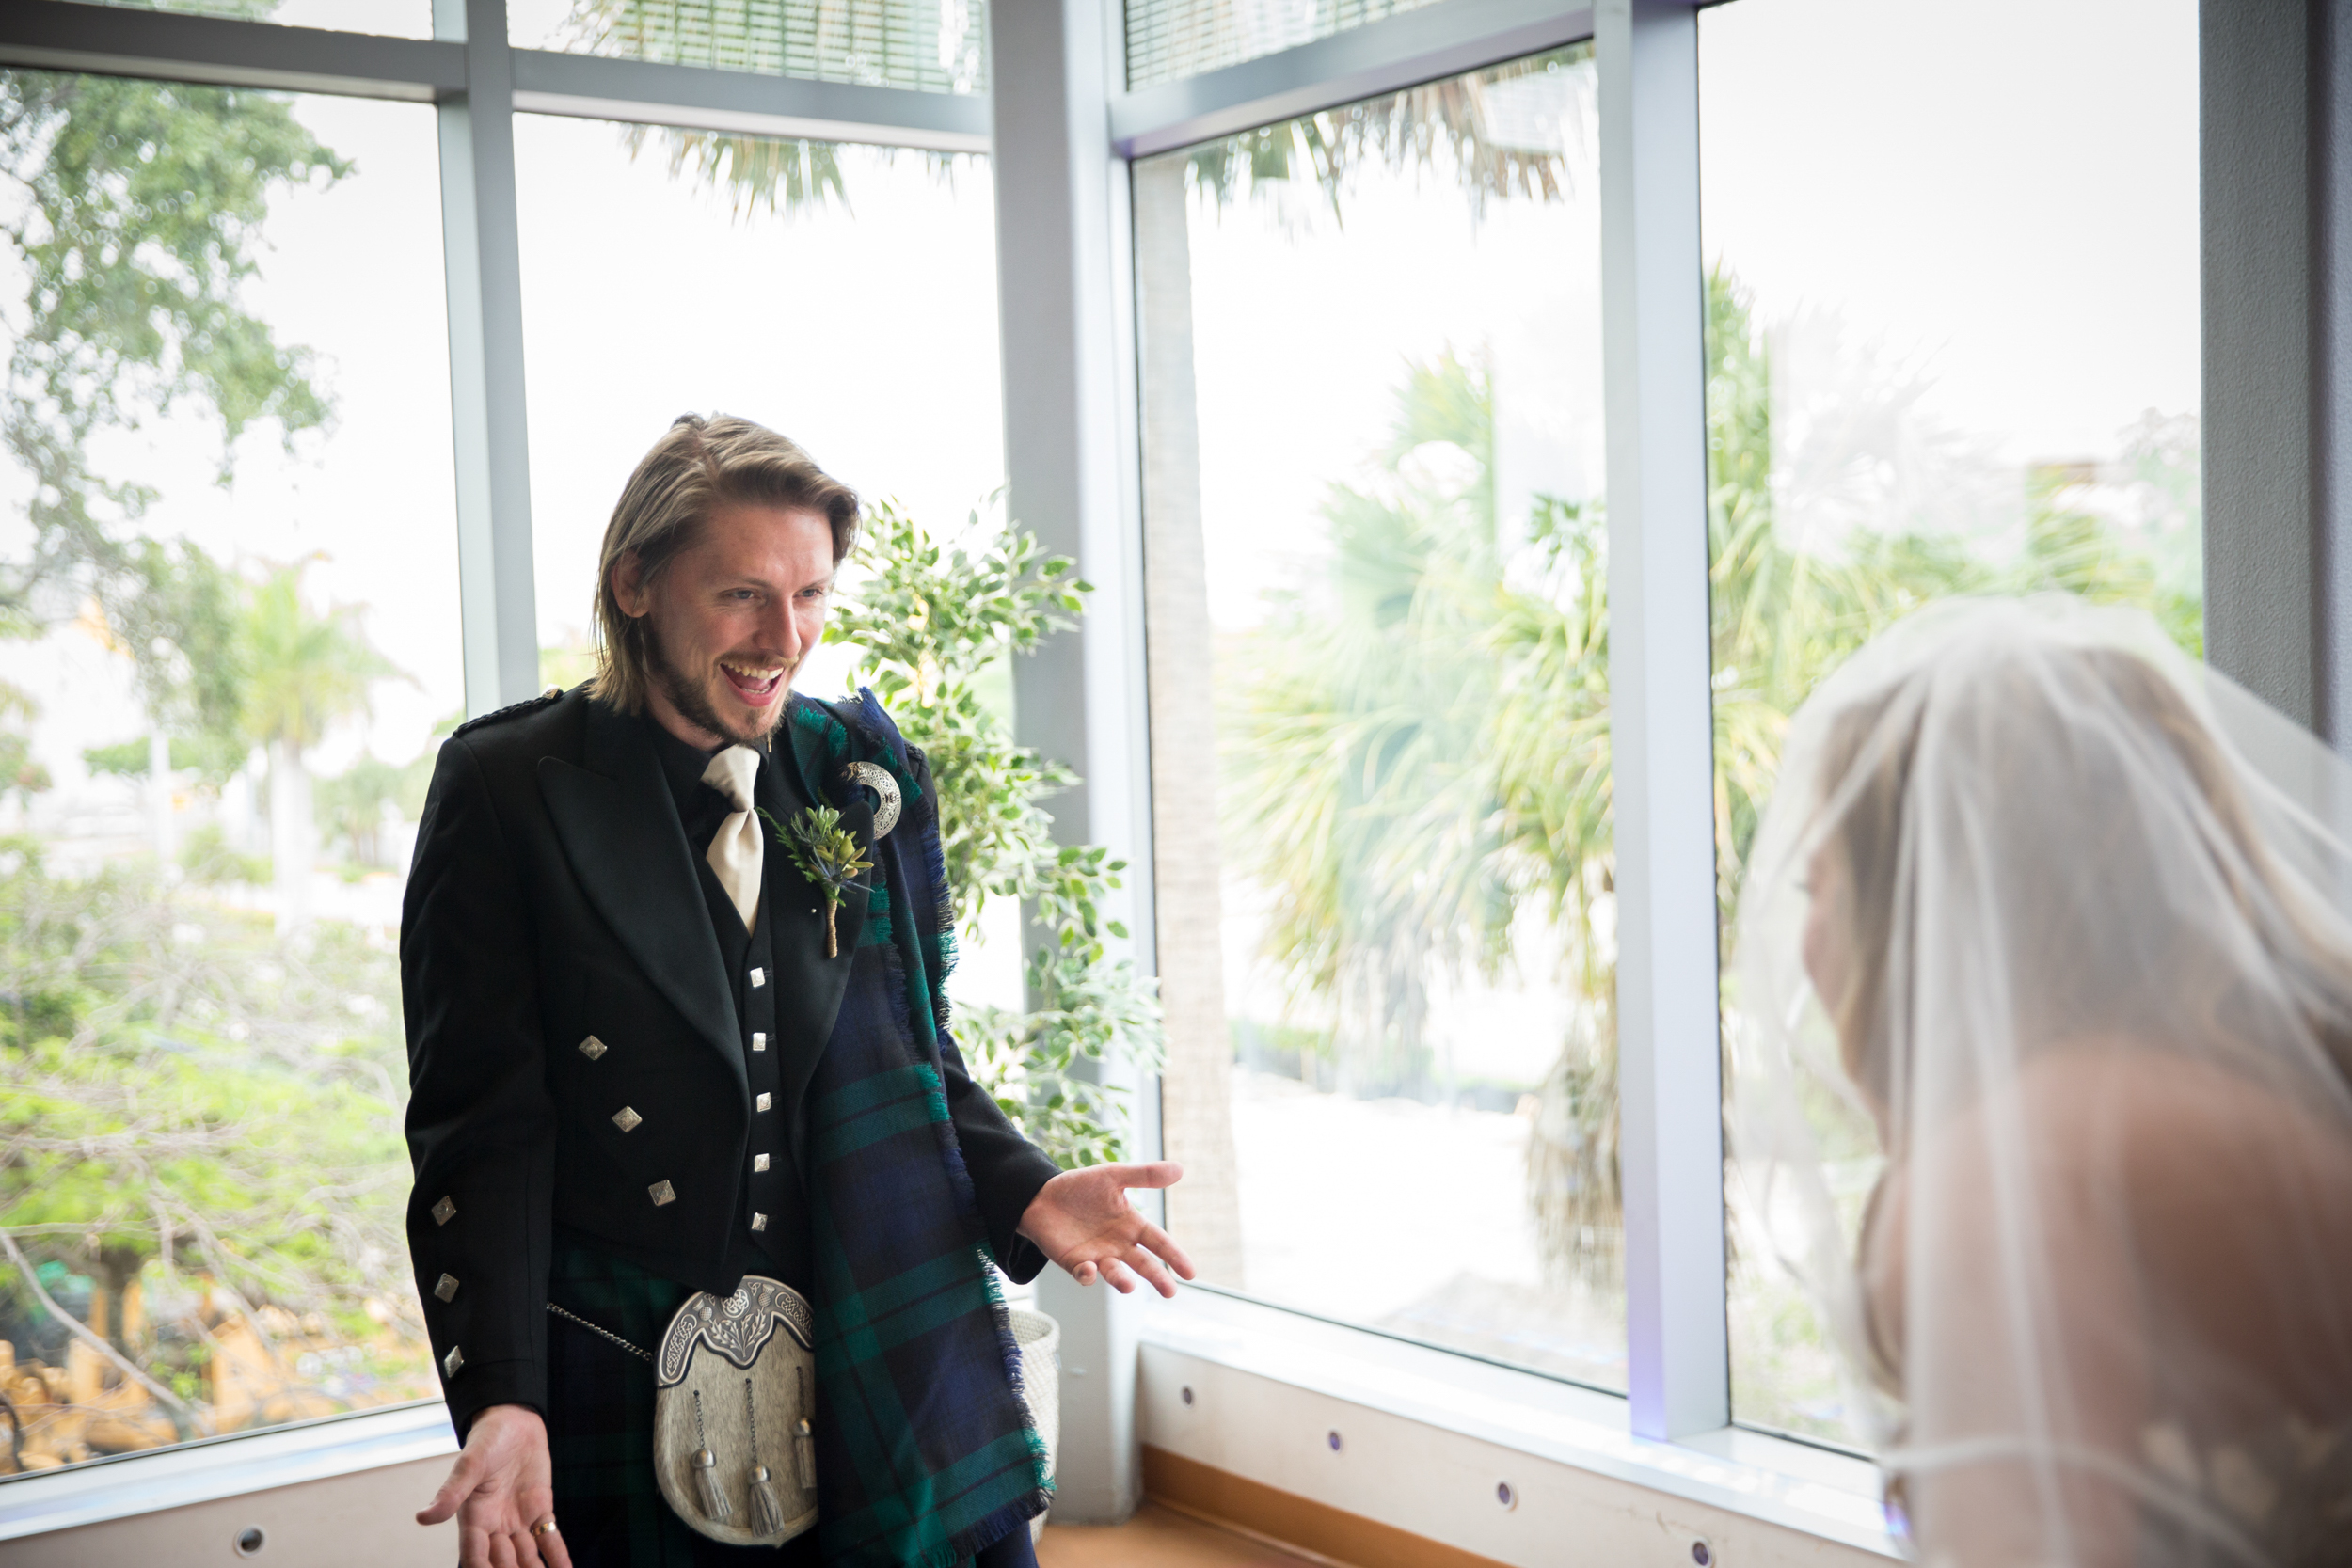 WEB_6-18-17_MindyChris_Wedding-114.jpg